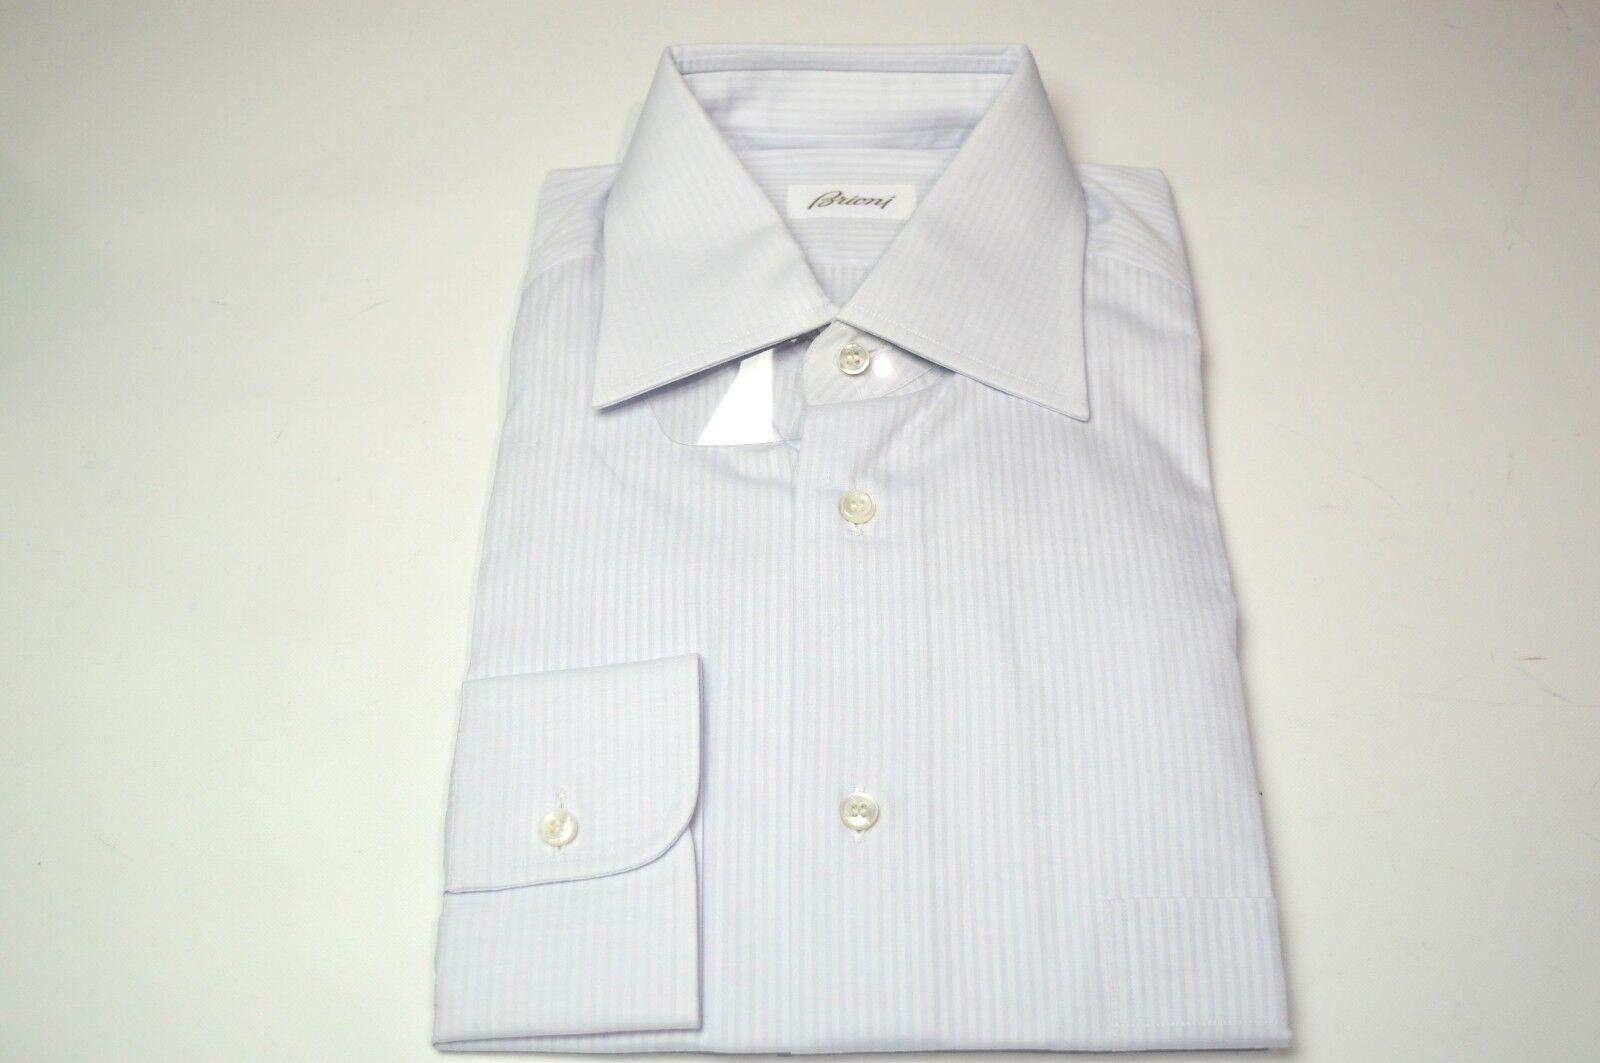 NEW  BRIONI Dress  SHIRT 100% Cotton Größe 17.5 Us 44 Eu  (ARA44)